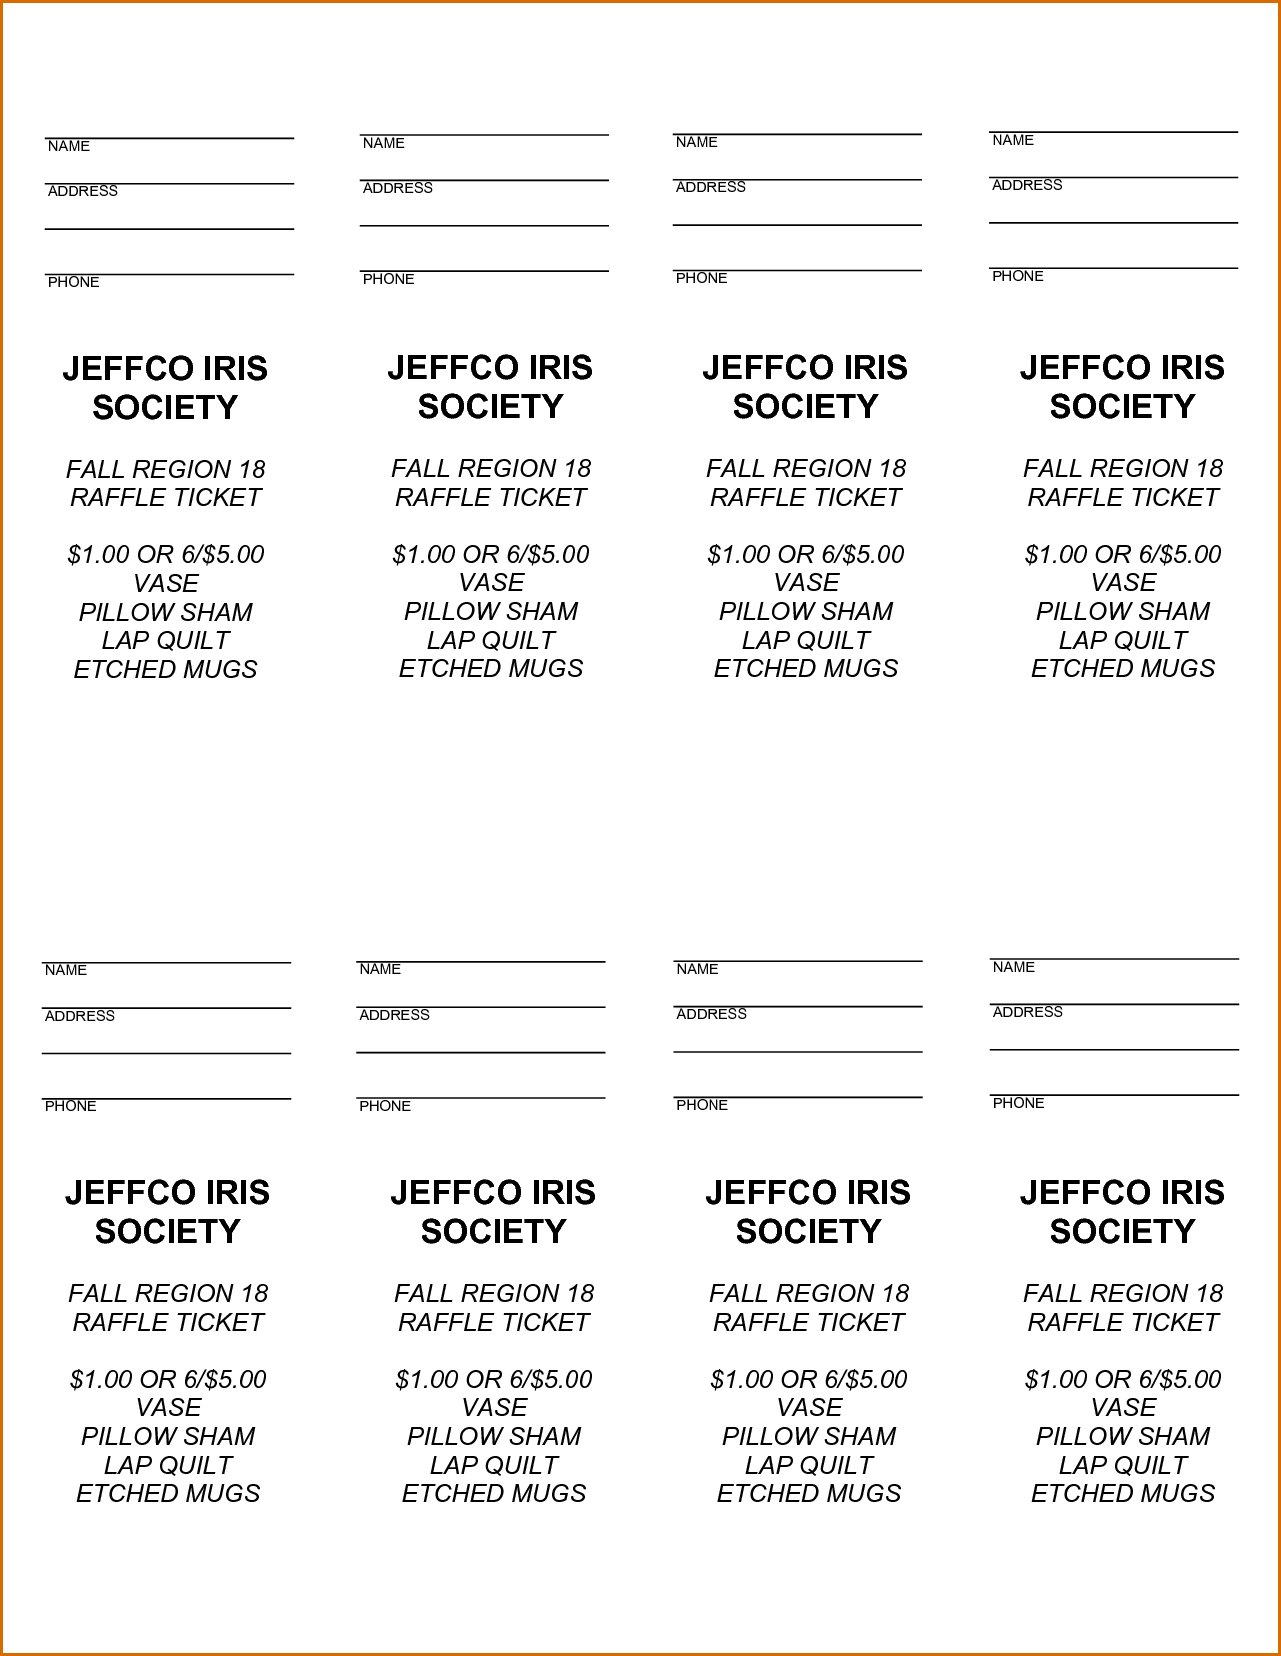 Free Printable Raffle Tickets - Free Printable Raffle Ticket - Free Printable Raffle Tickets